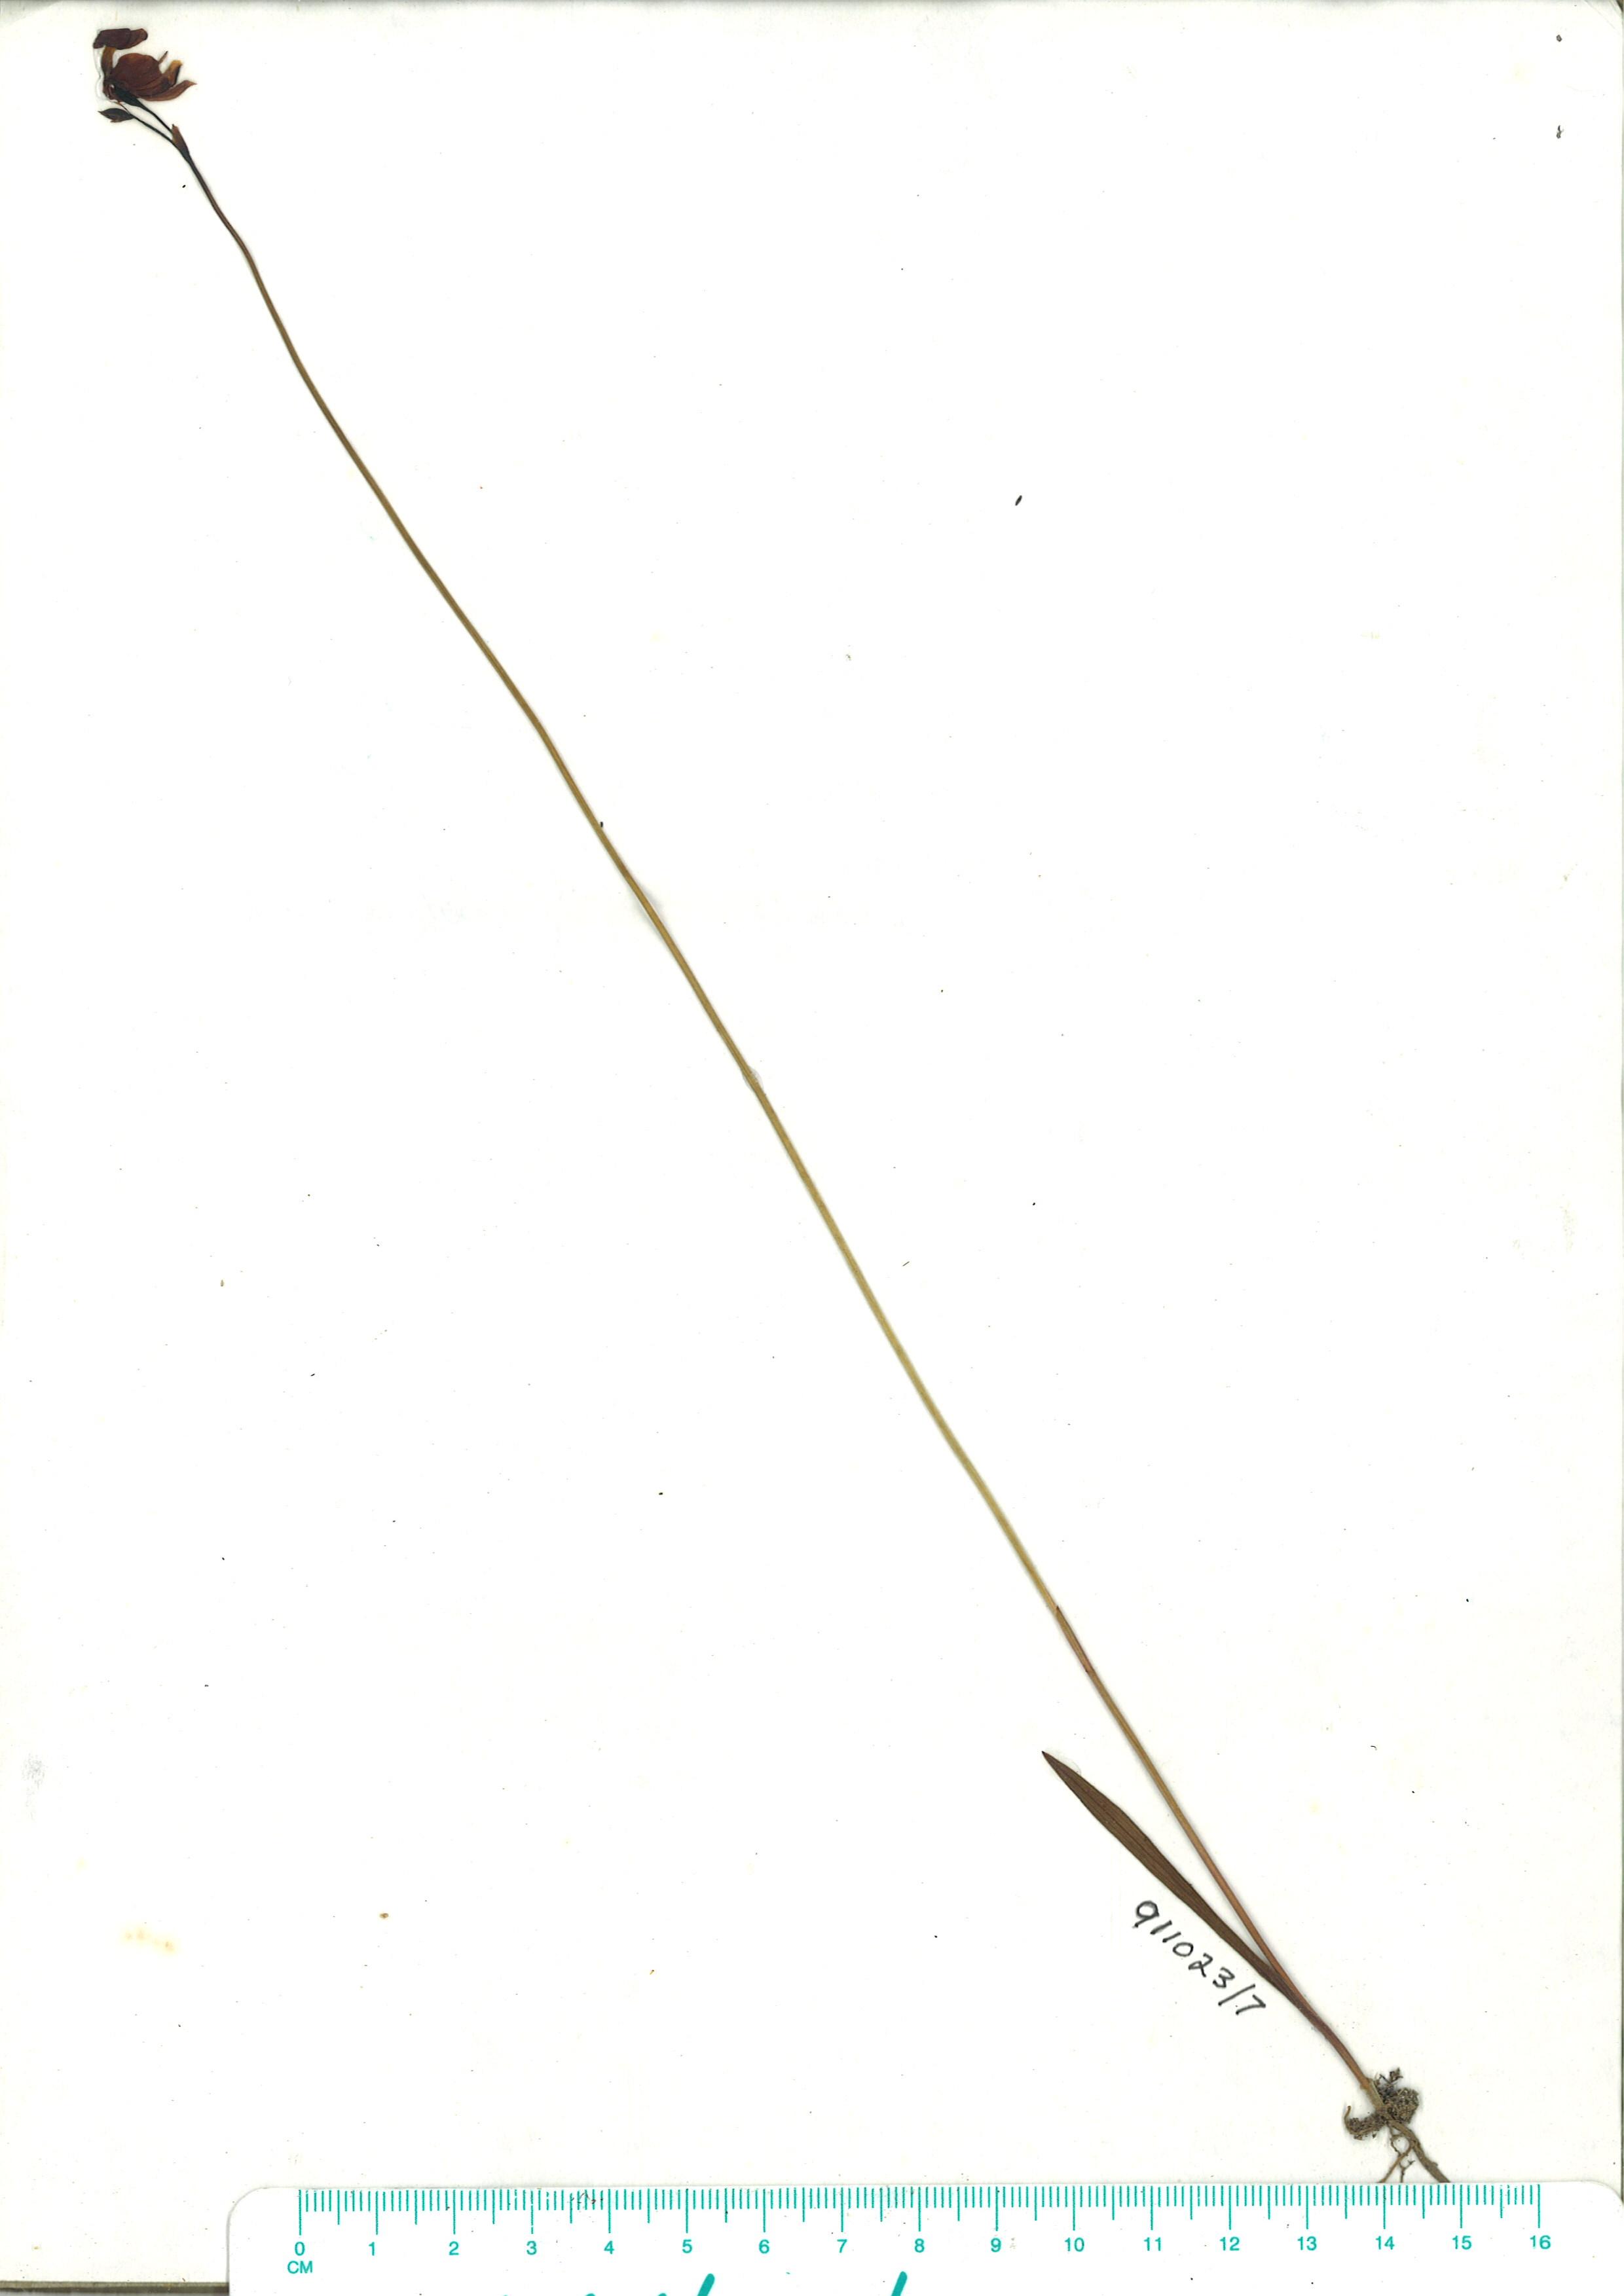 Scanned herbarium image of Calaena major